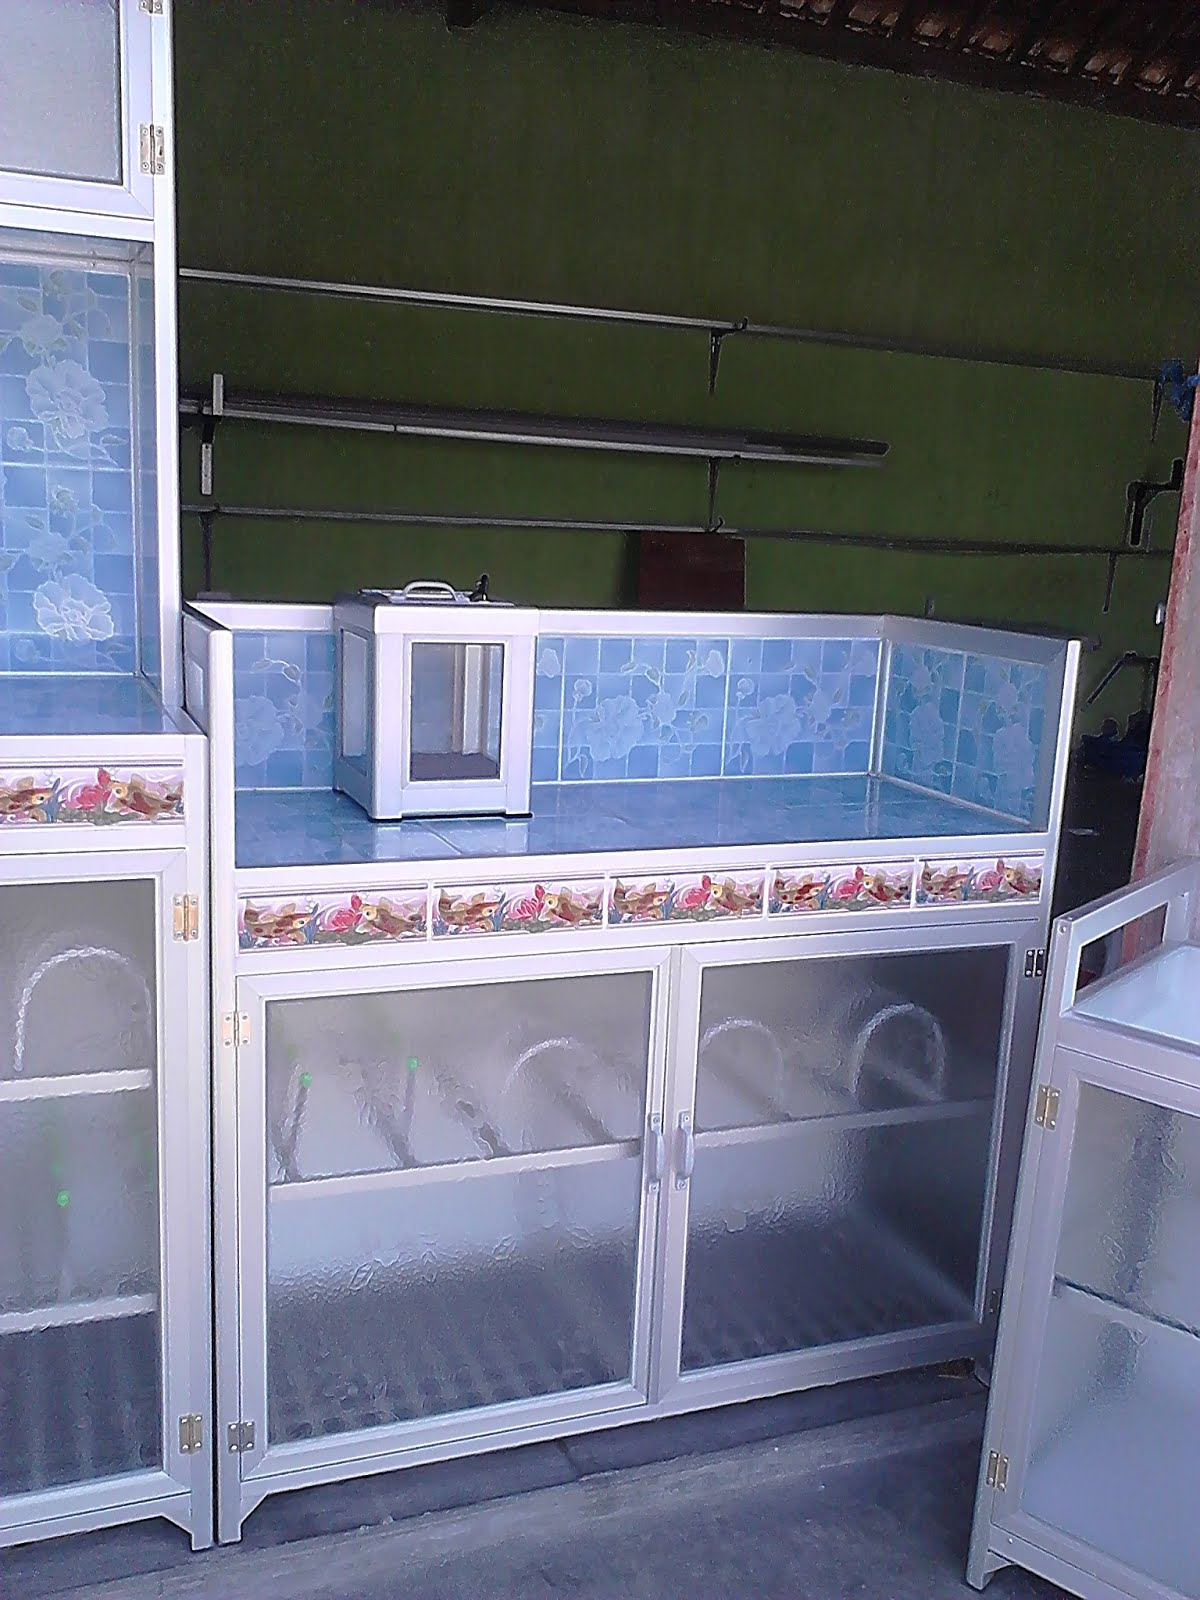 Harga kitchen set aluminium murah jual for Harga kitchen set stainless per meter